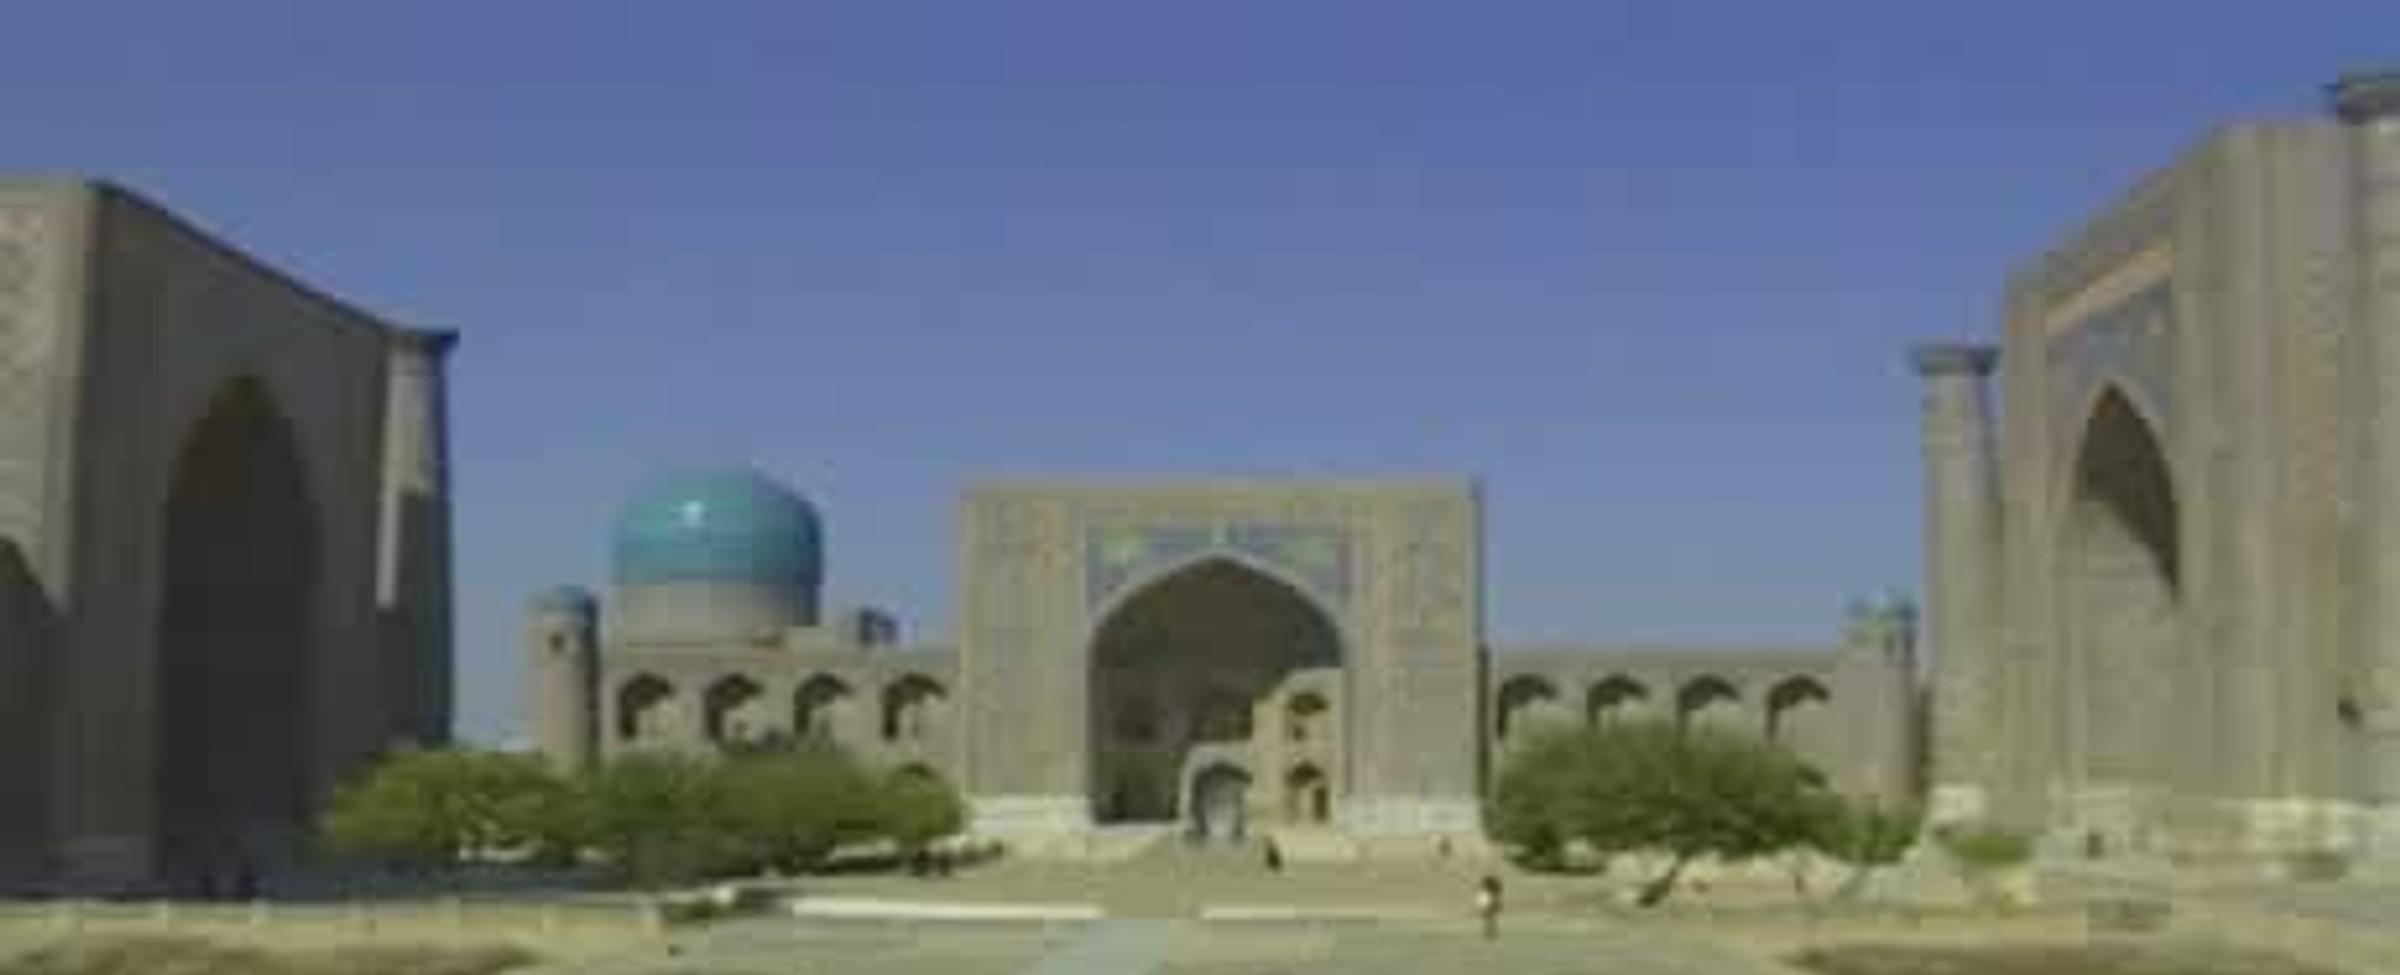 Záhada Timurovy krypty